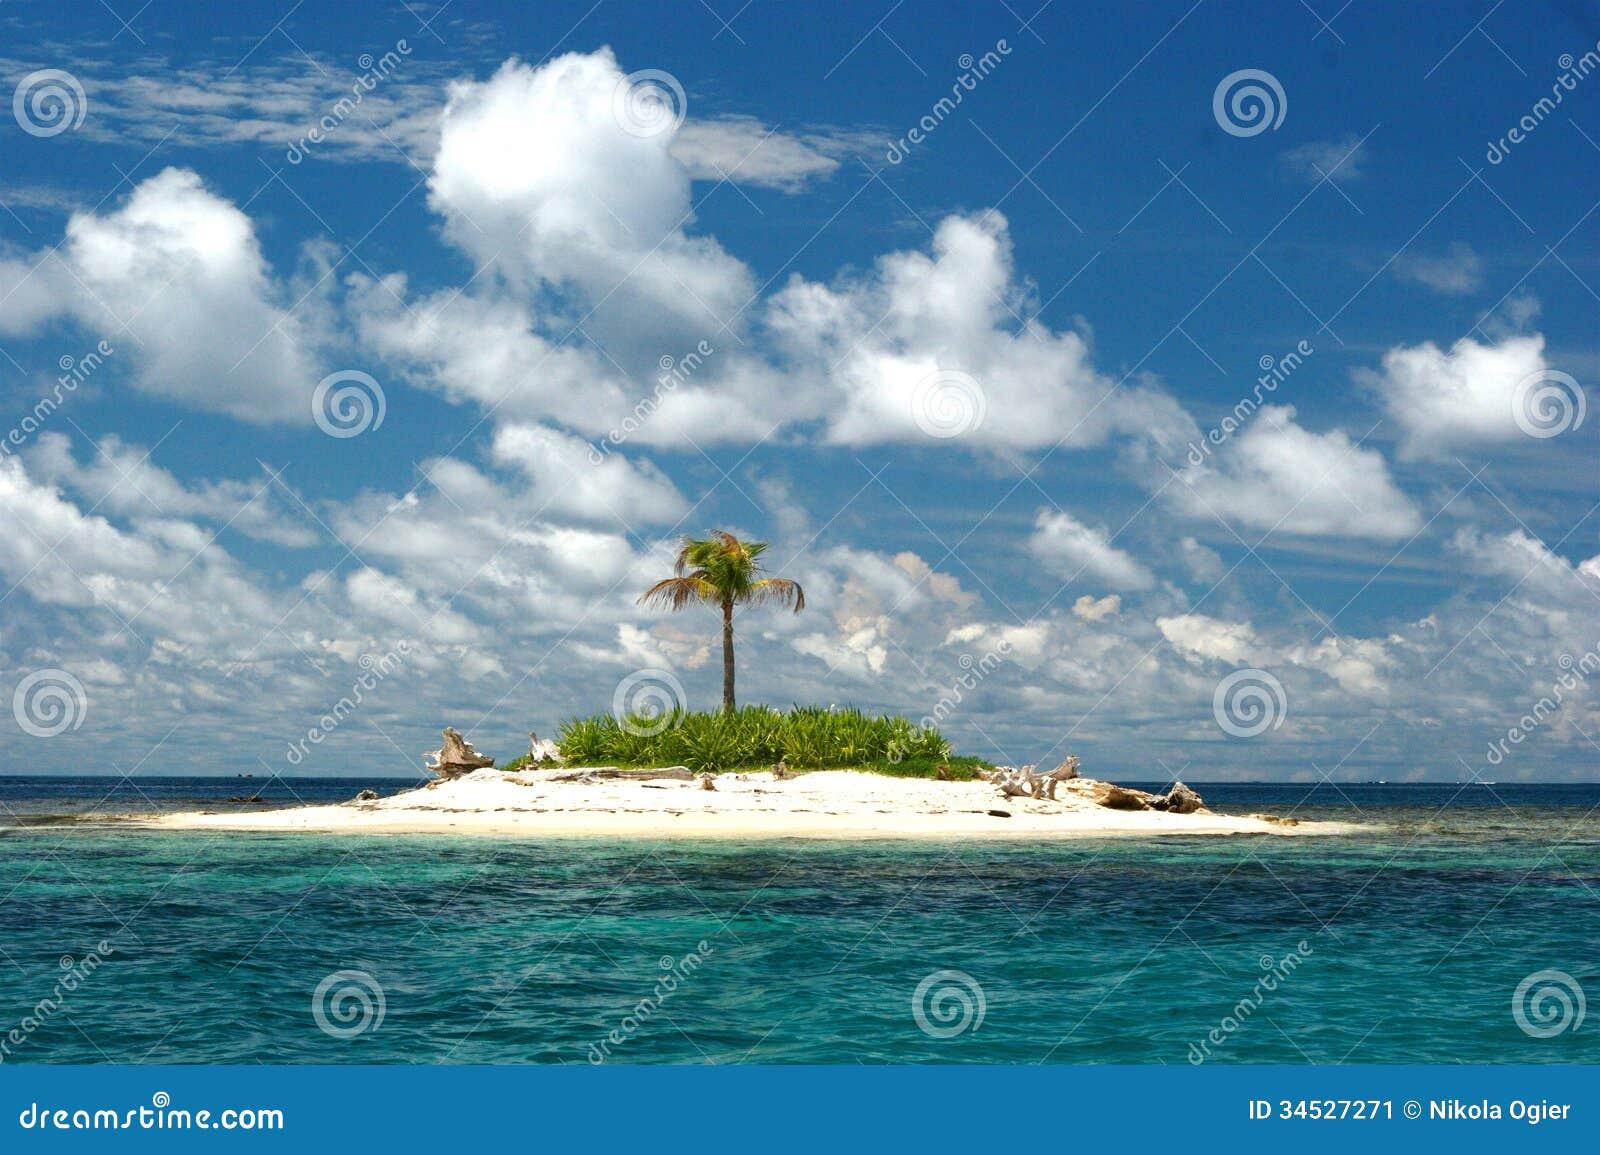 Deserted Tropical Island: Deserted Tropical Island Stock Image